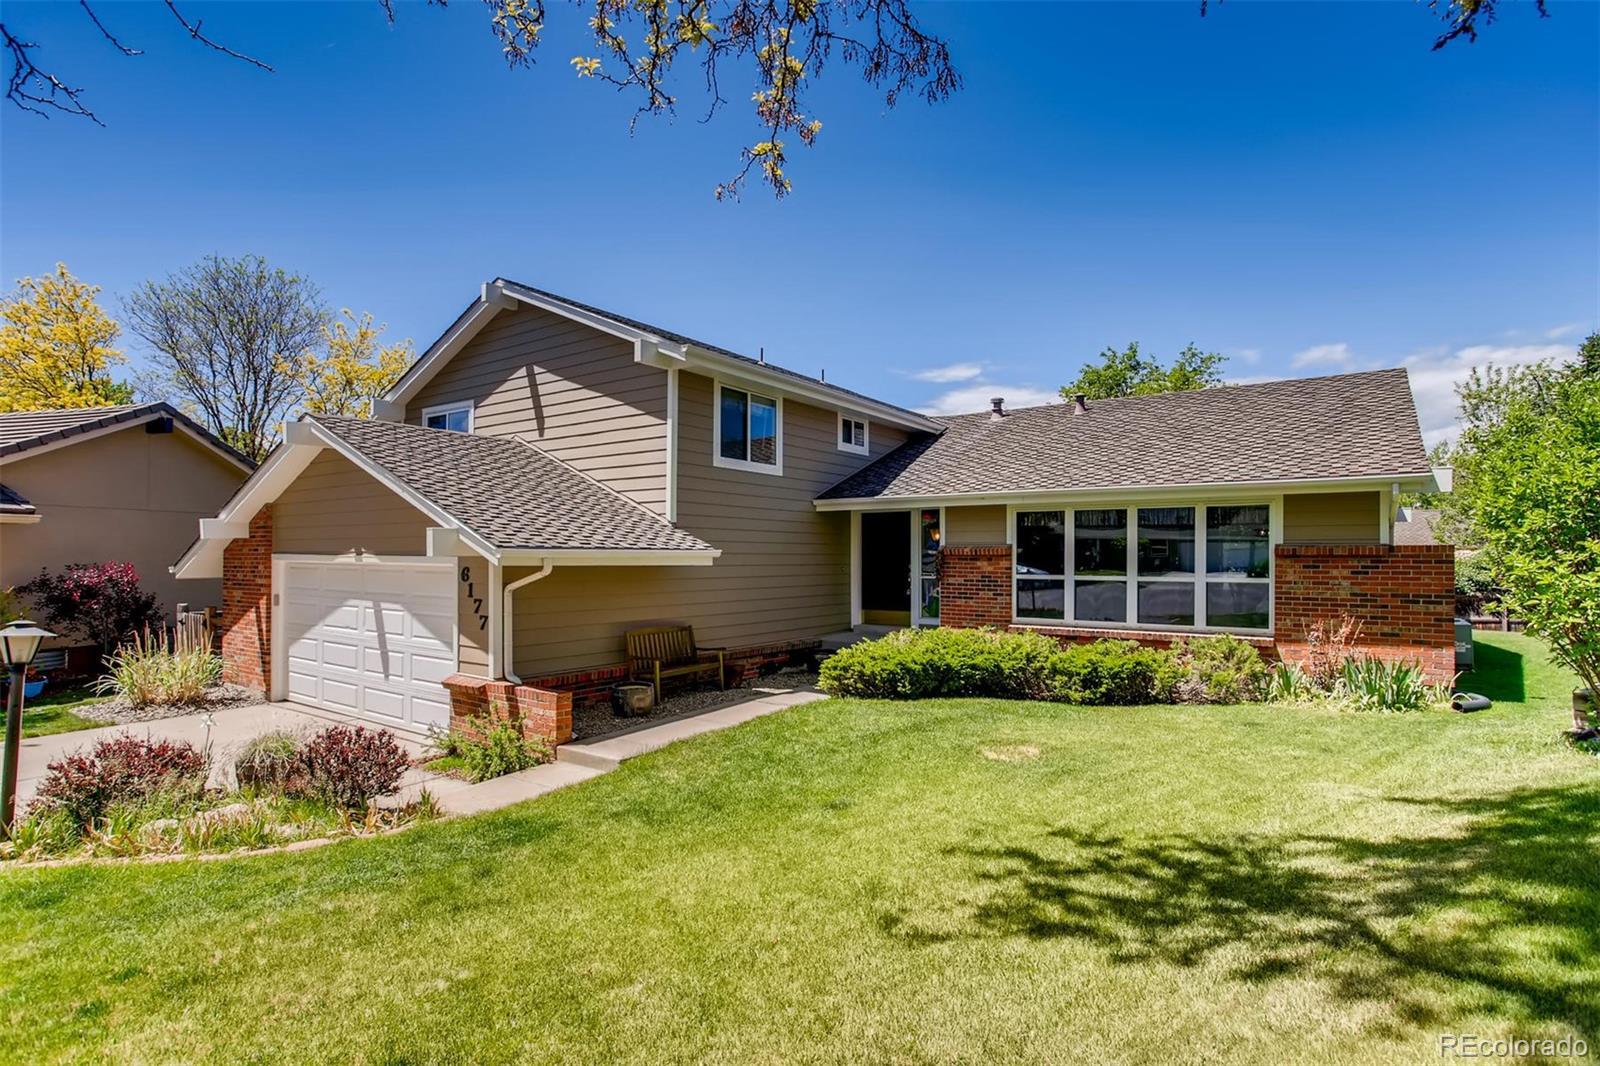 6177 S Grape Court, Centennial, CO 80121 - Centennial, CO real estate listing